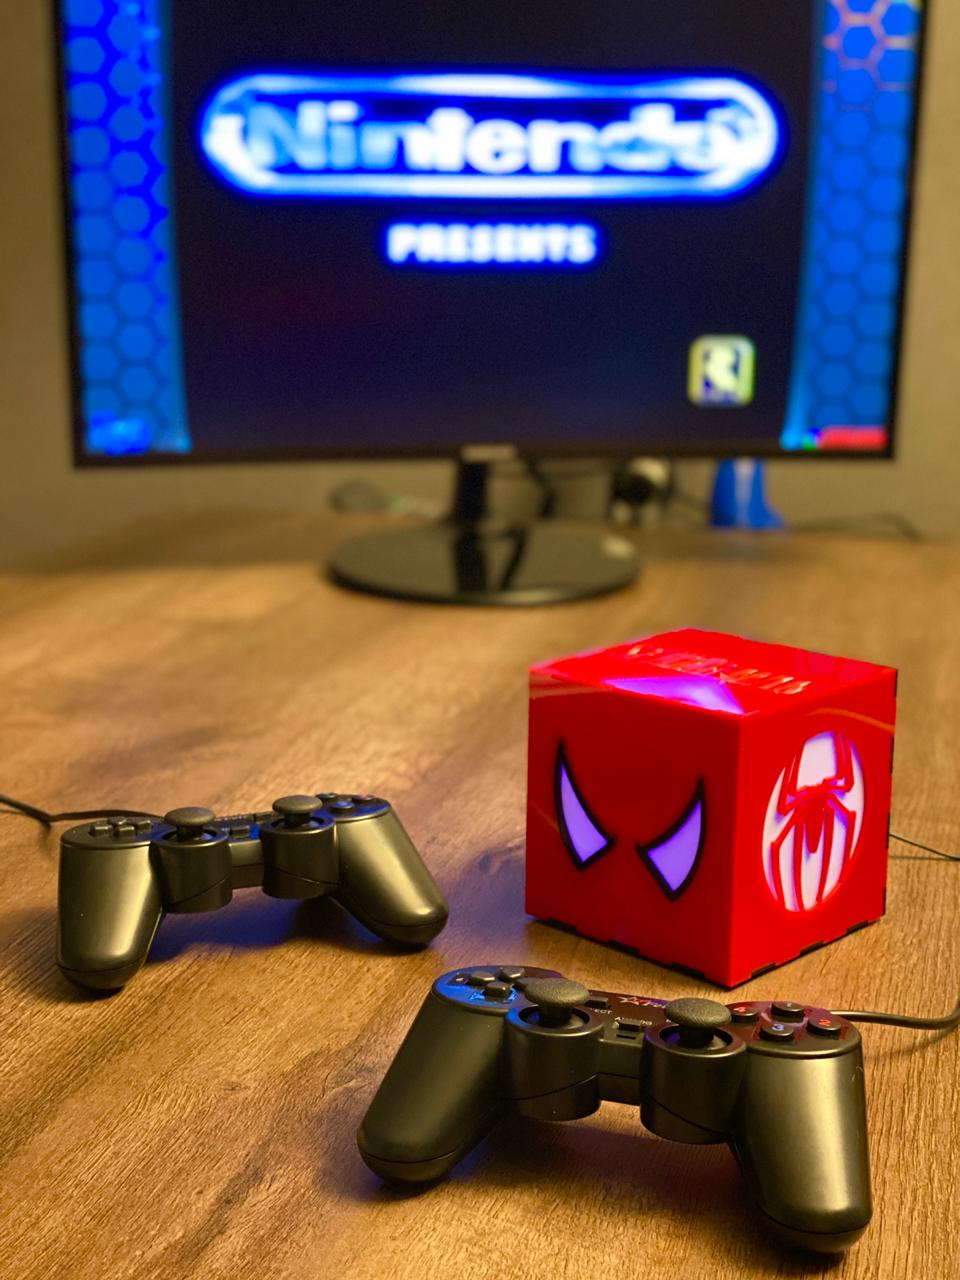 Cubo Retrô Box Homem-Aranha: Fliperama Arcade Game (20.000 Jogos) PlayStation/Nintendo/SNES/Mega Drive/Sega Saturn - EV